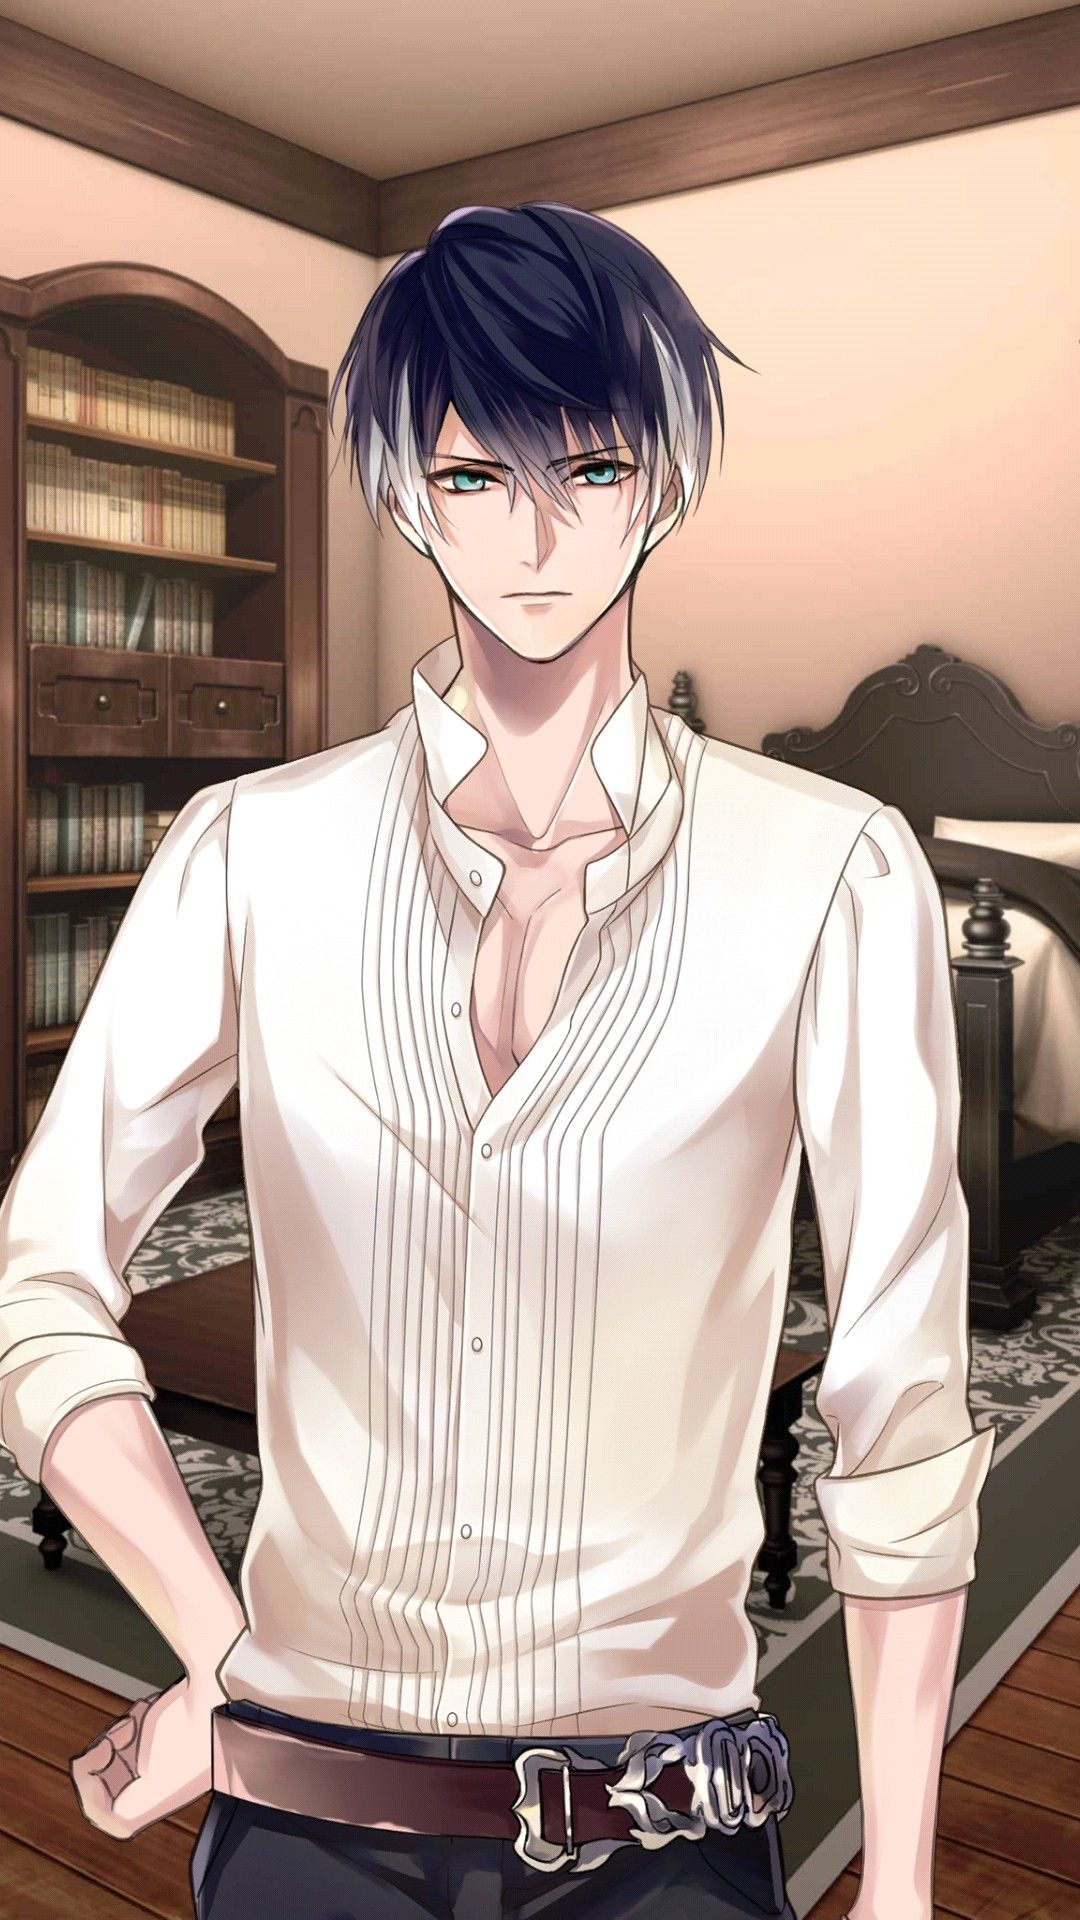 Ikemen Vampire in 2020 Anime boyfriend, Hot anime guys